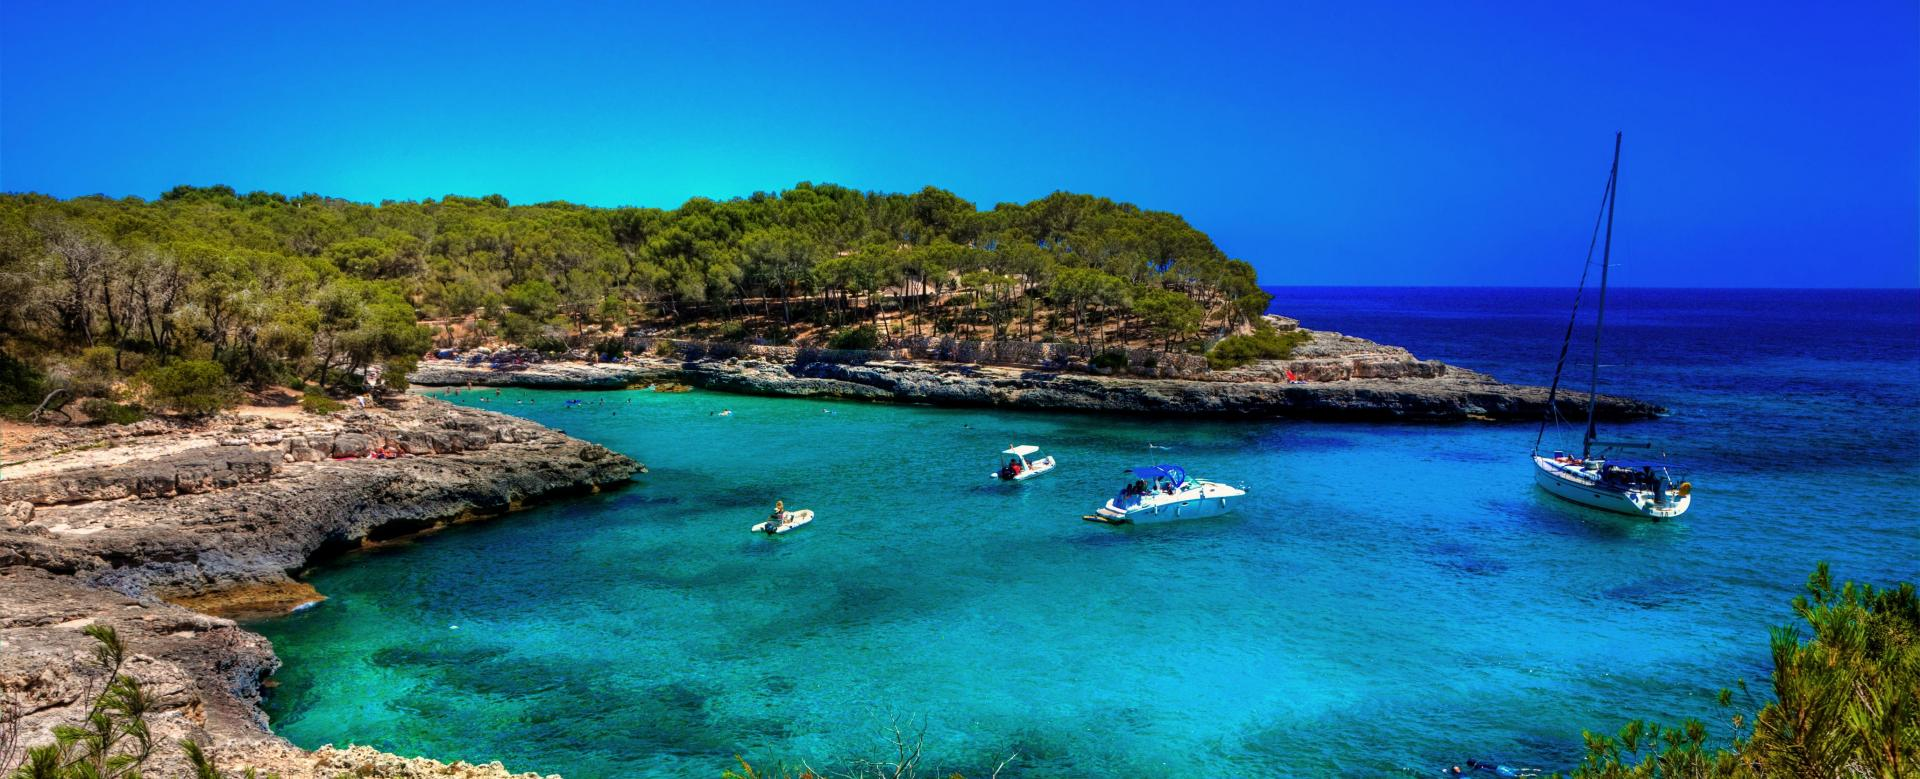 Voyage sur l'eau : La Palma : Majorque et minorque